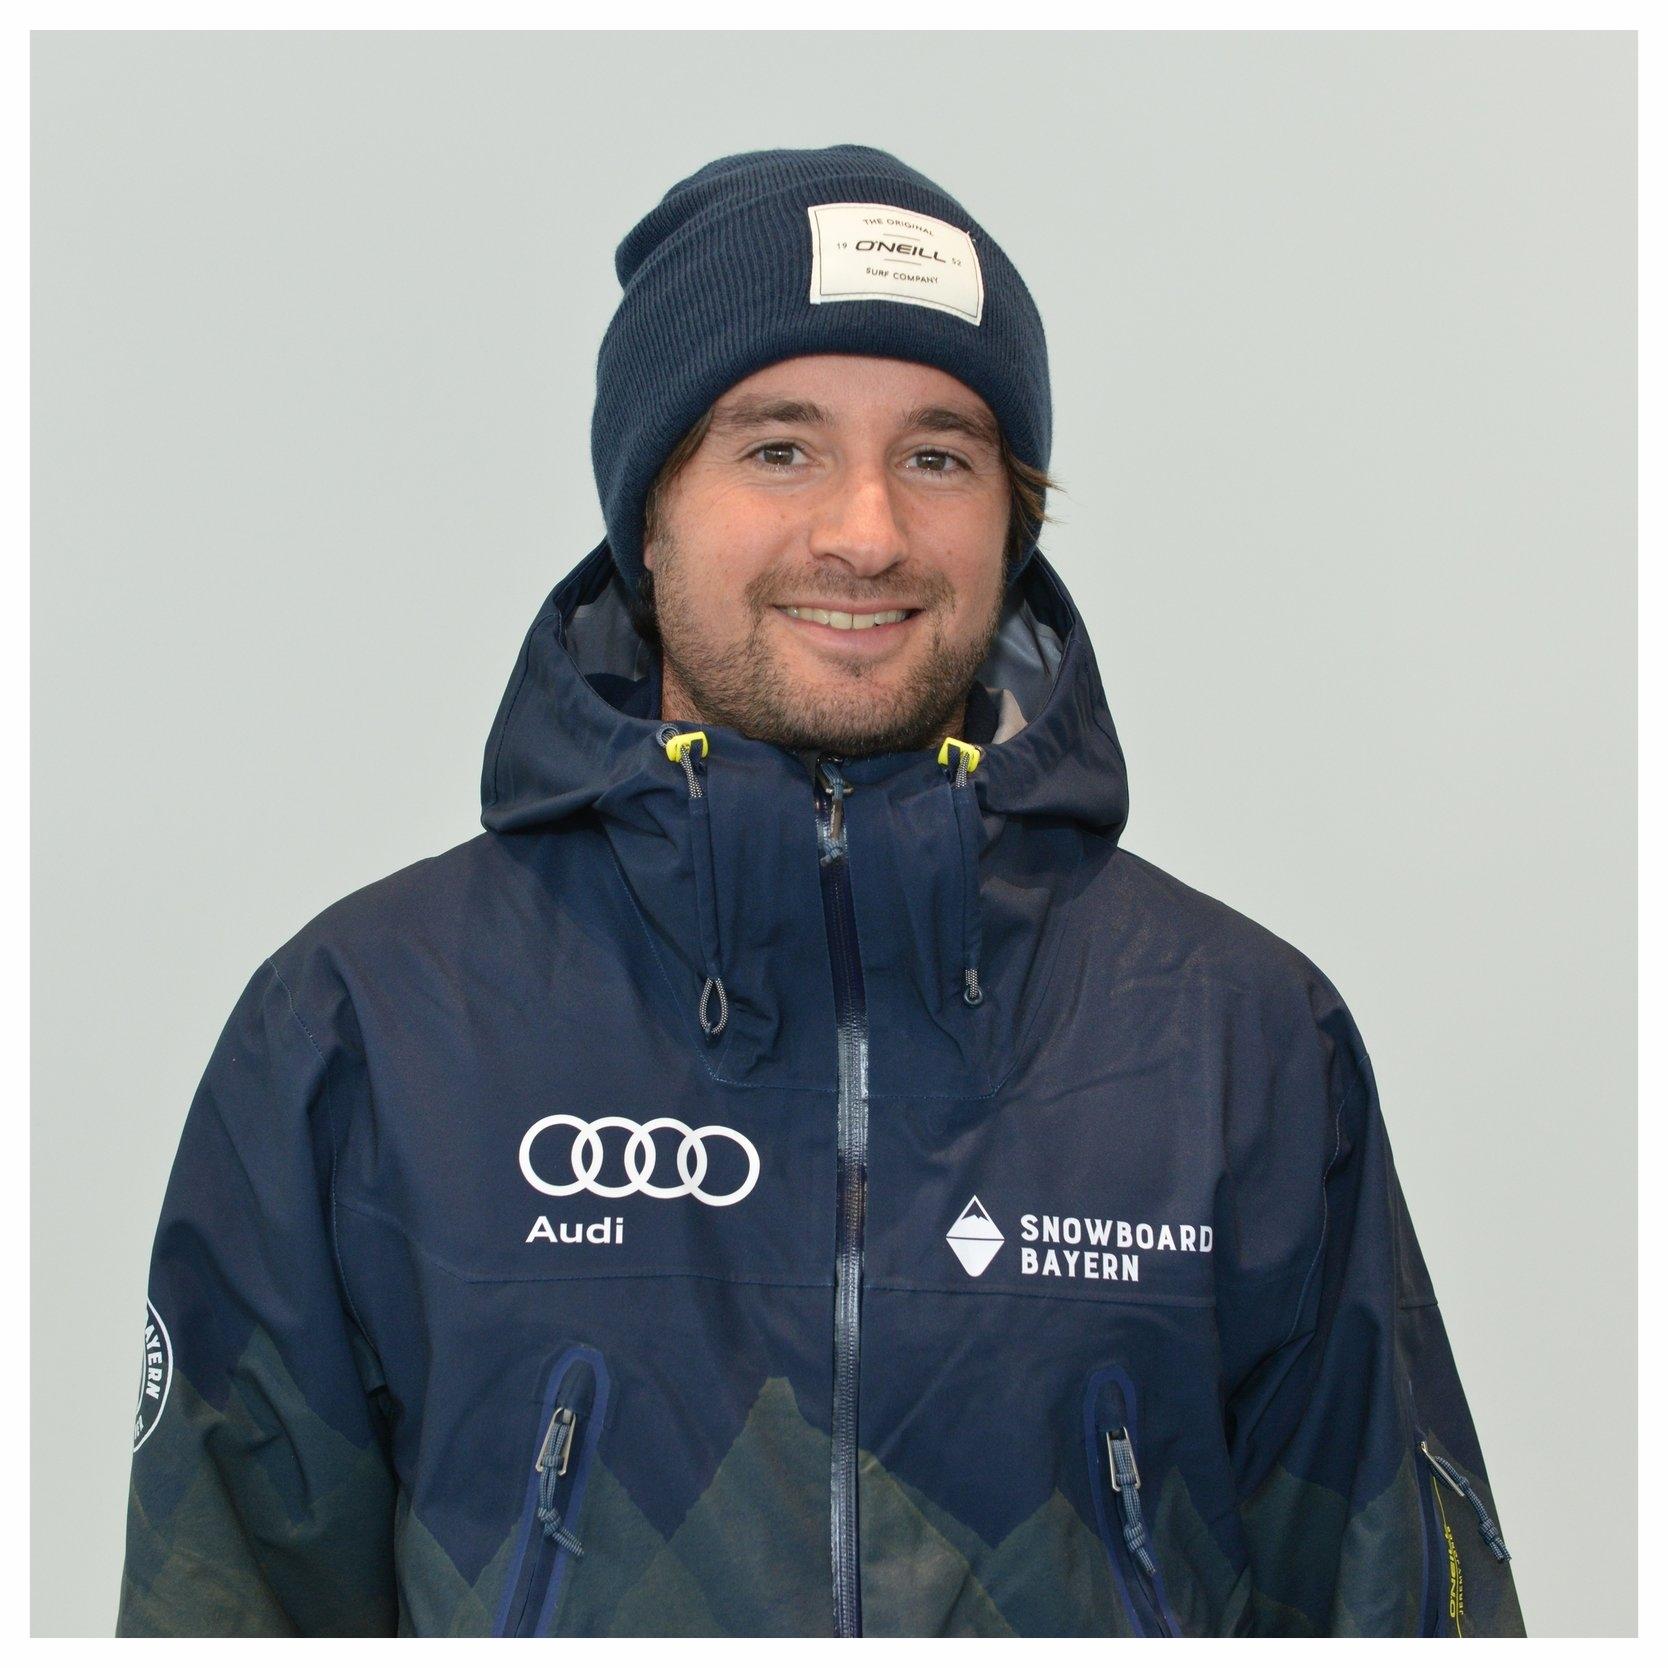 Andy Jügelt (Snowboard Bayern)